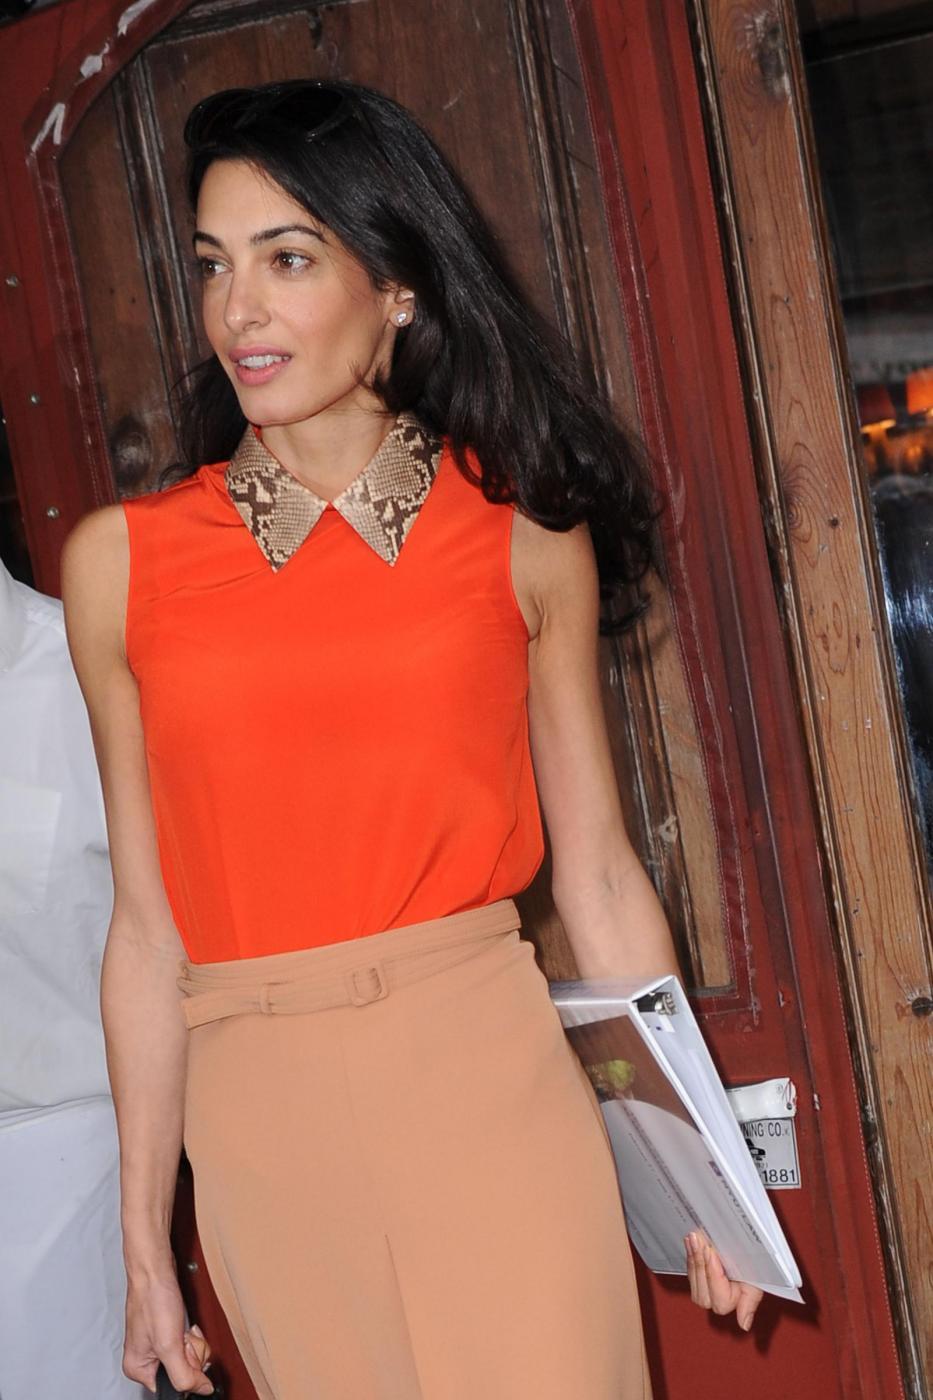 Amal Alamuddin magrissima, lady Clooney quasi scheletrica FOTO 12